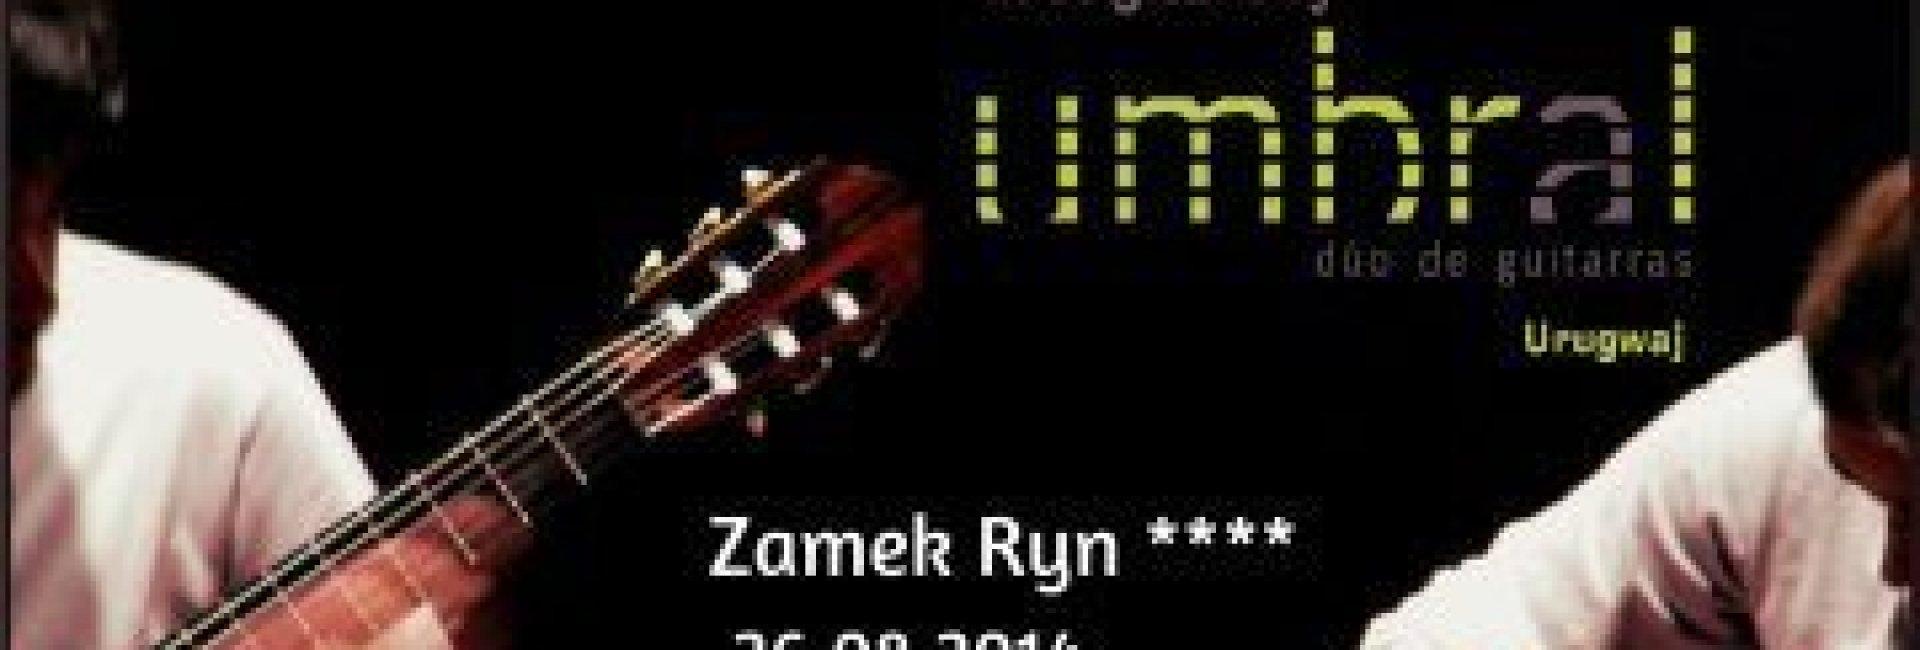 Duet gitarowy Umbral